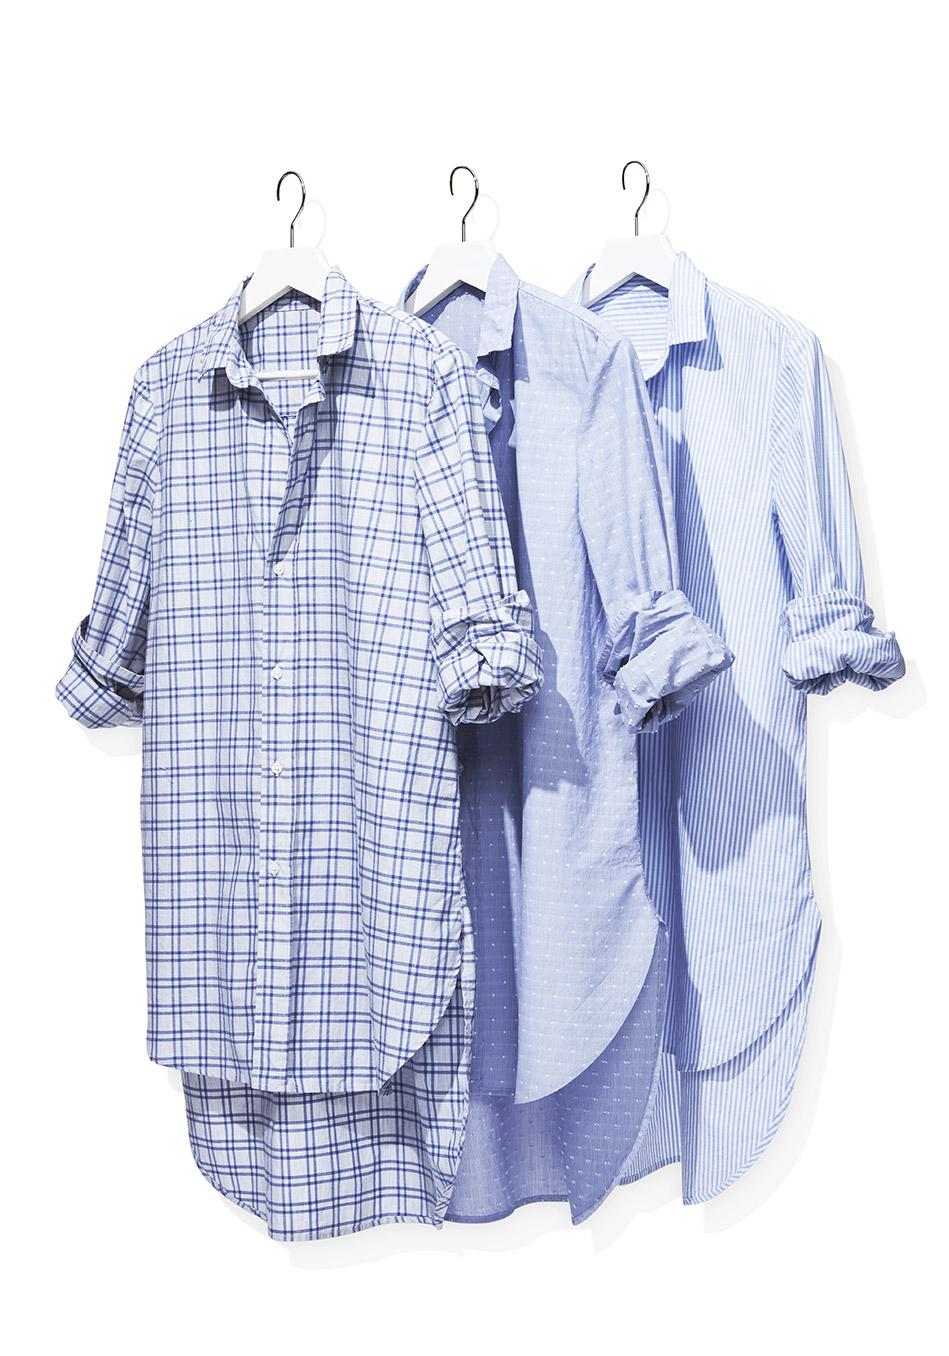 August 2016 O List Frank Eileen Grayson Shirts